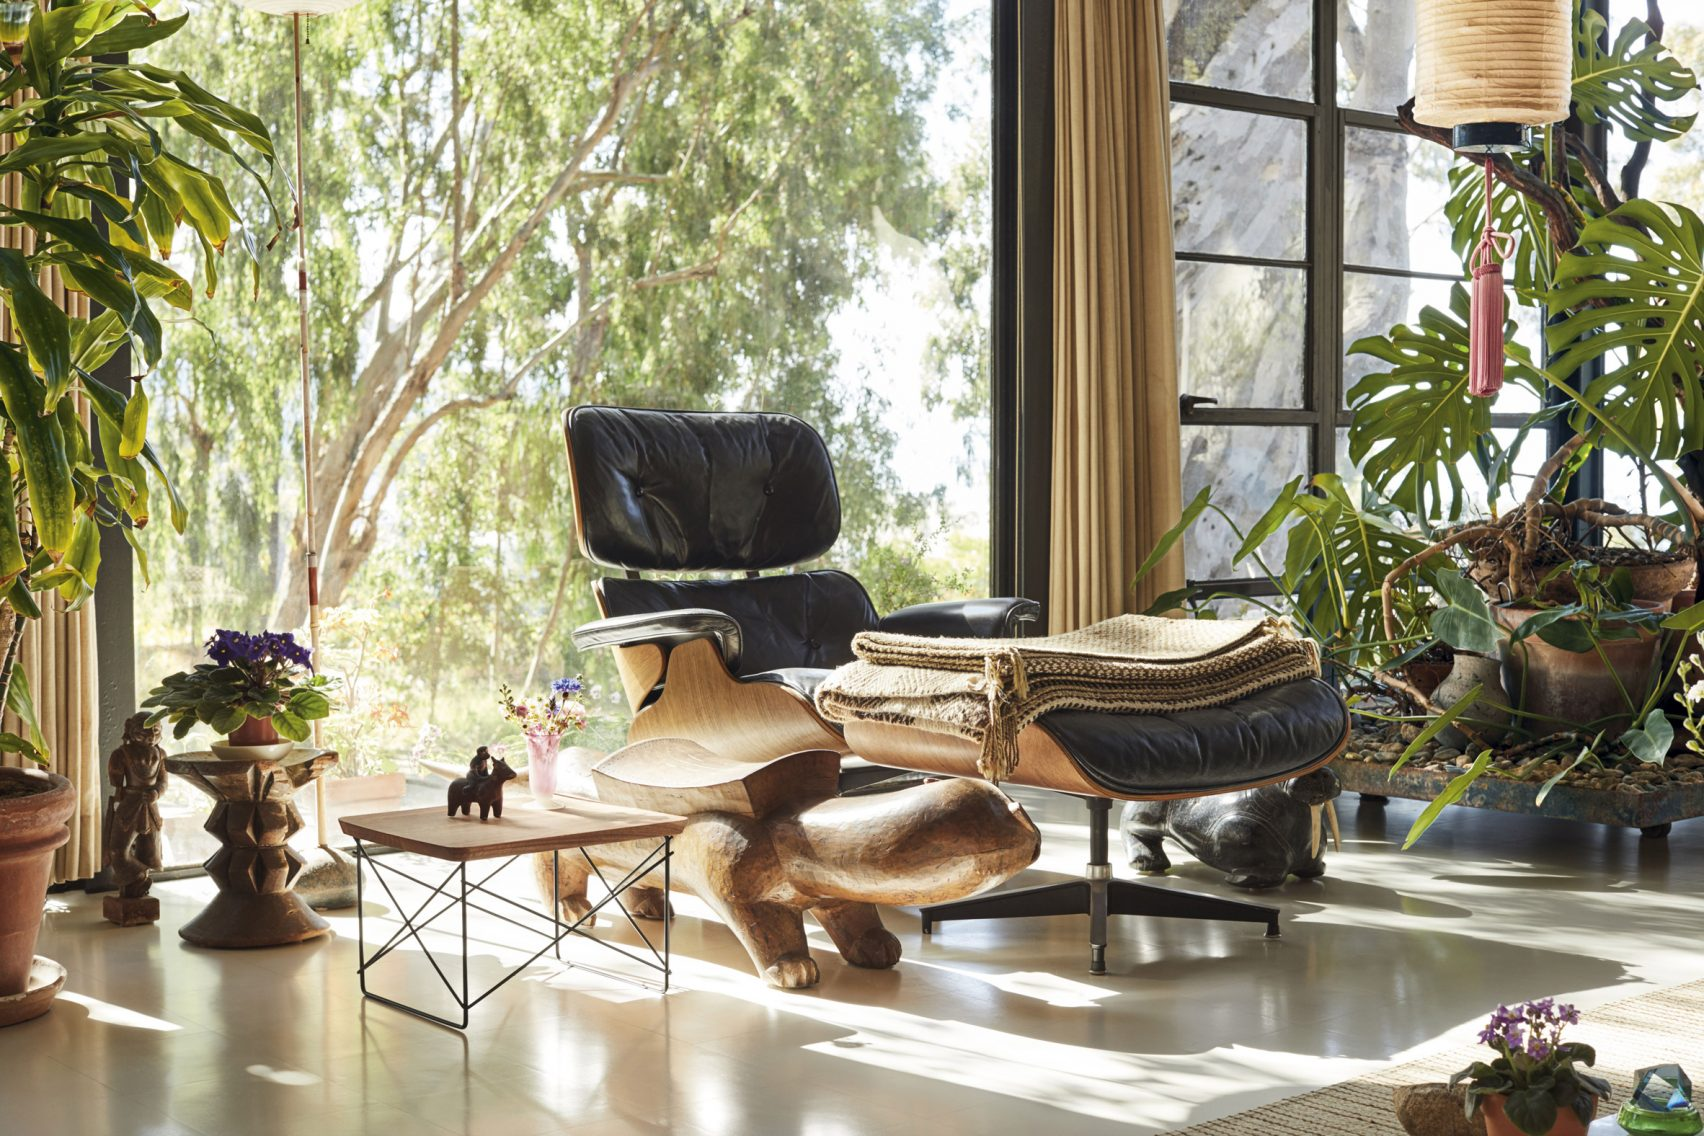 vitra-herman-miller-eames-eucalyptus-ltr-tables-_dezeen_2364_col_11-1704x1136.jpg